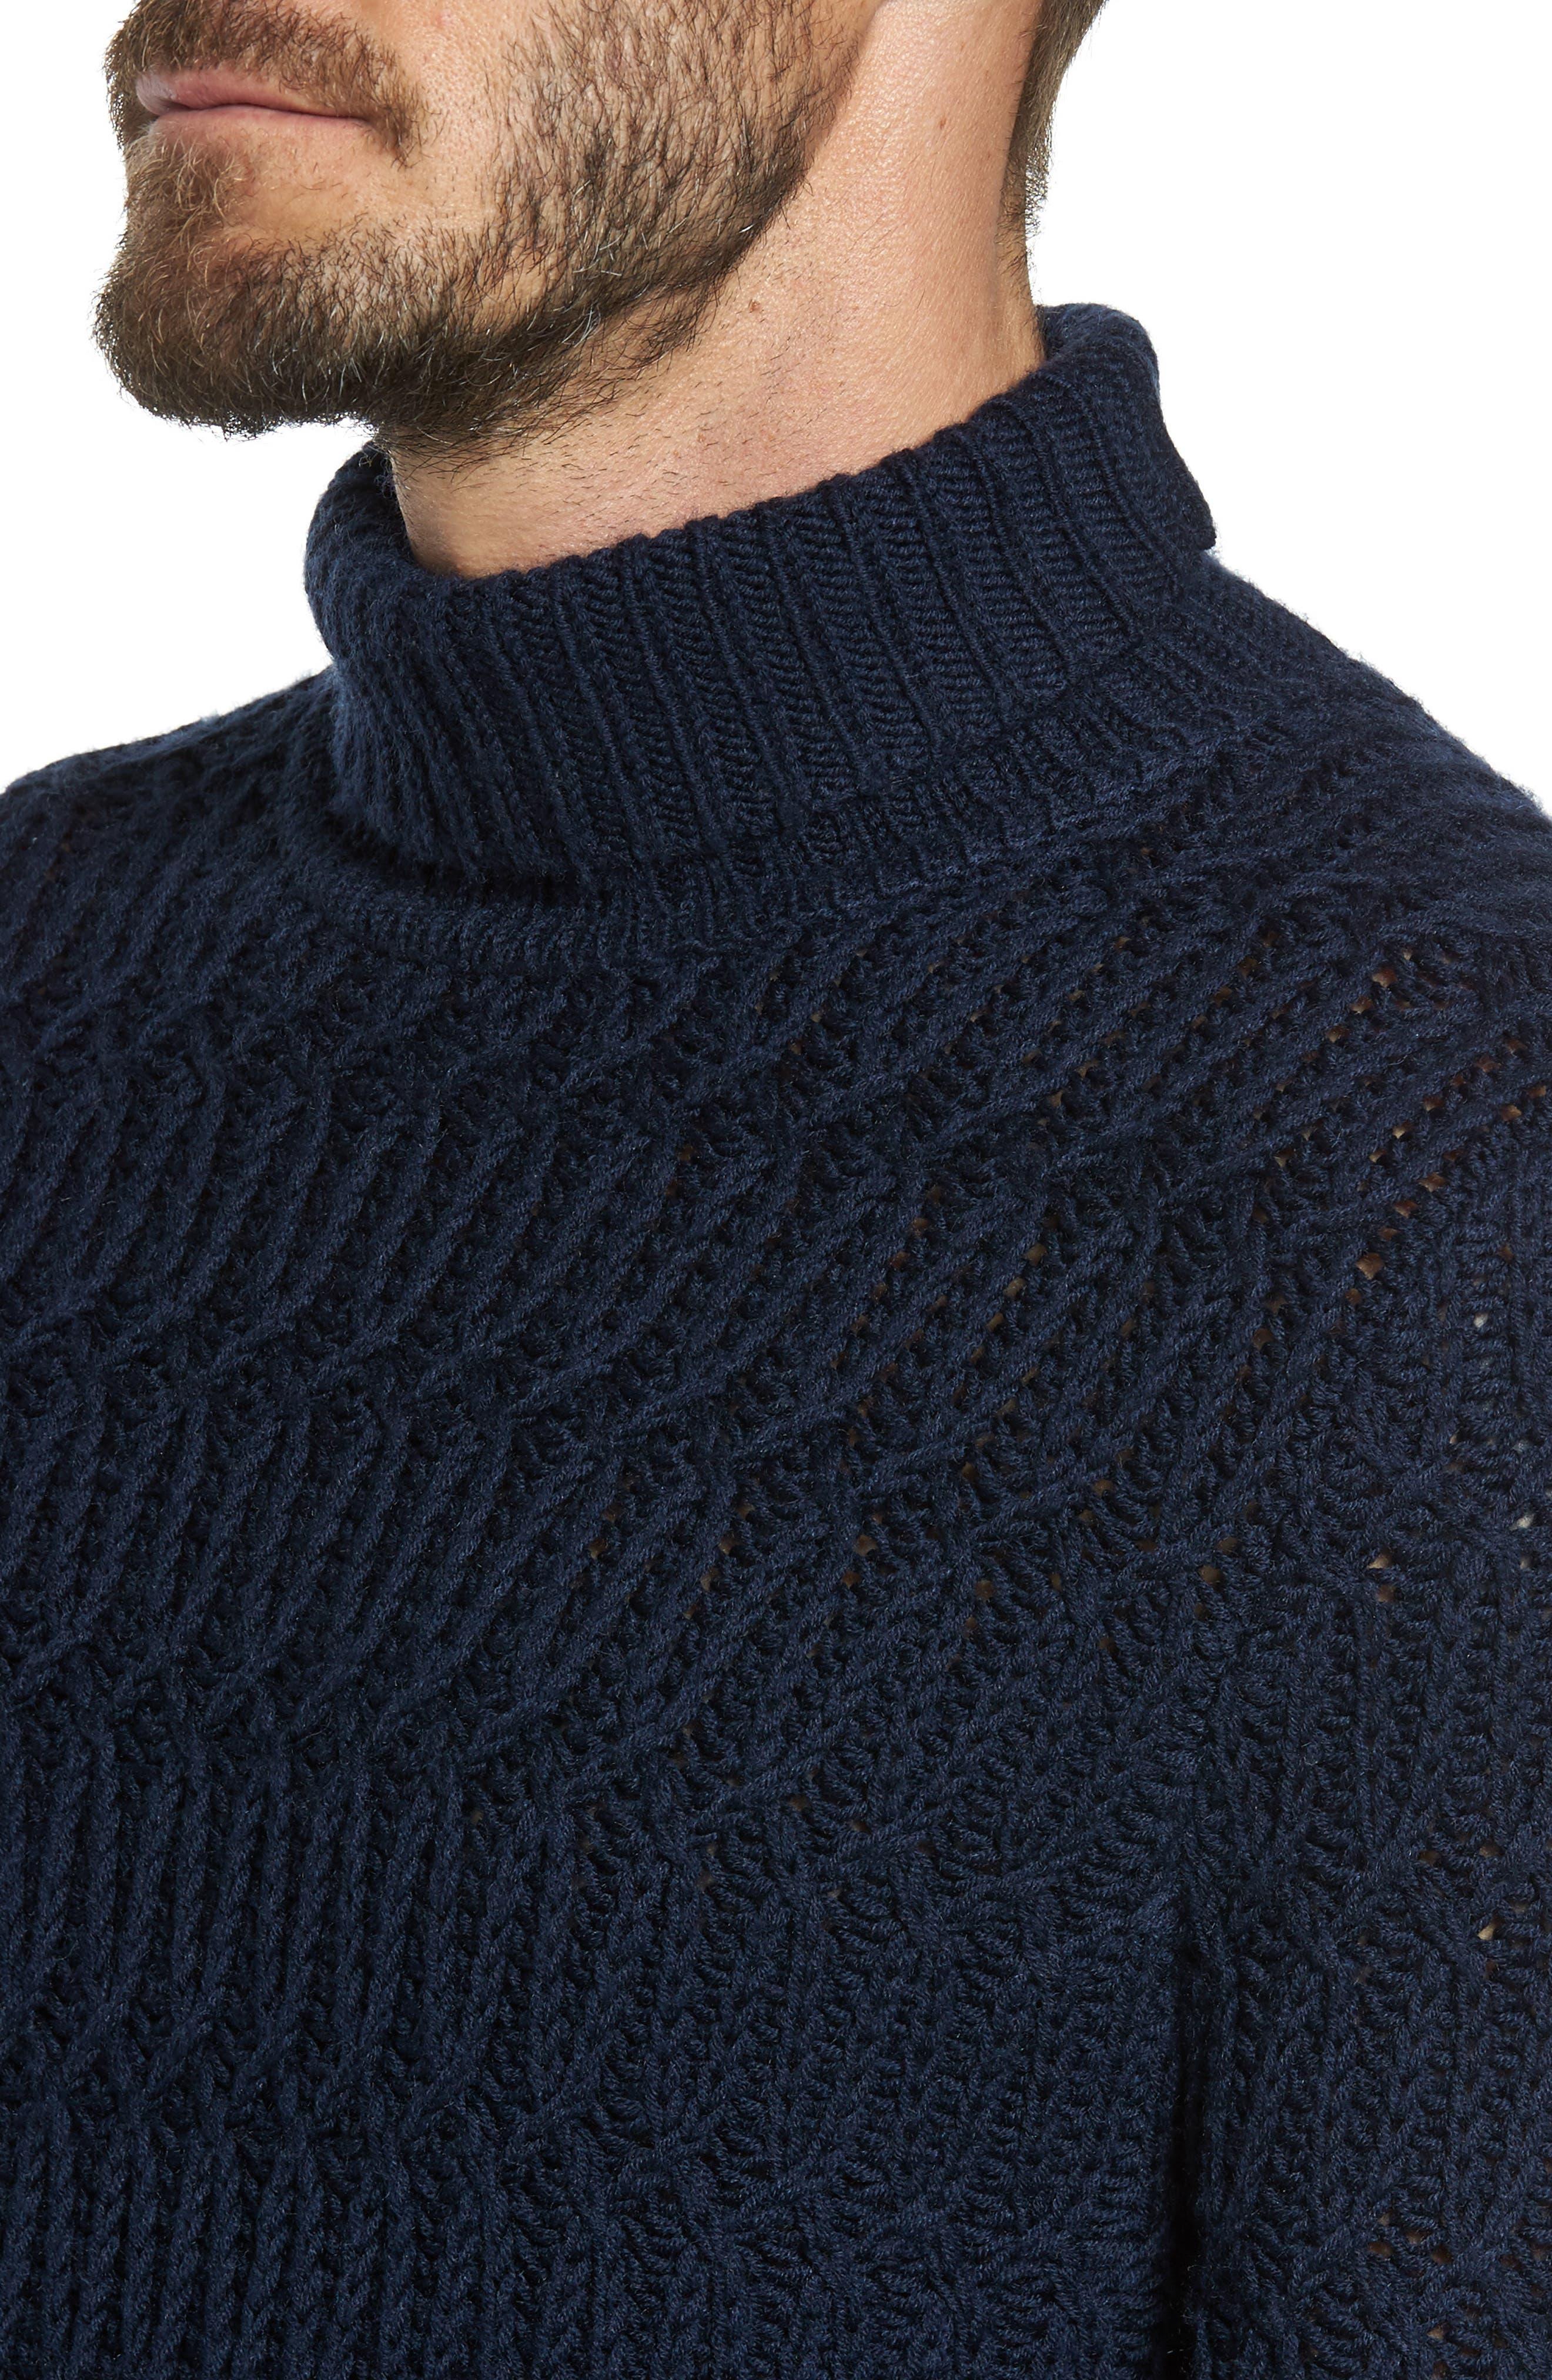 Chunky Turtleneck Sweater,                             Alternate thumbnail 6, color,                             Navy Iris